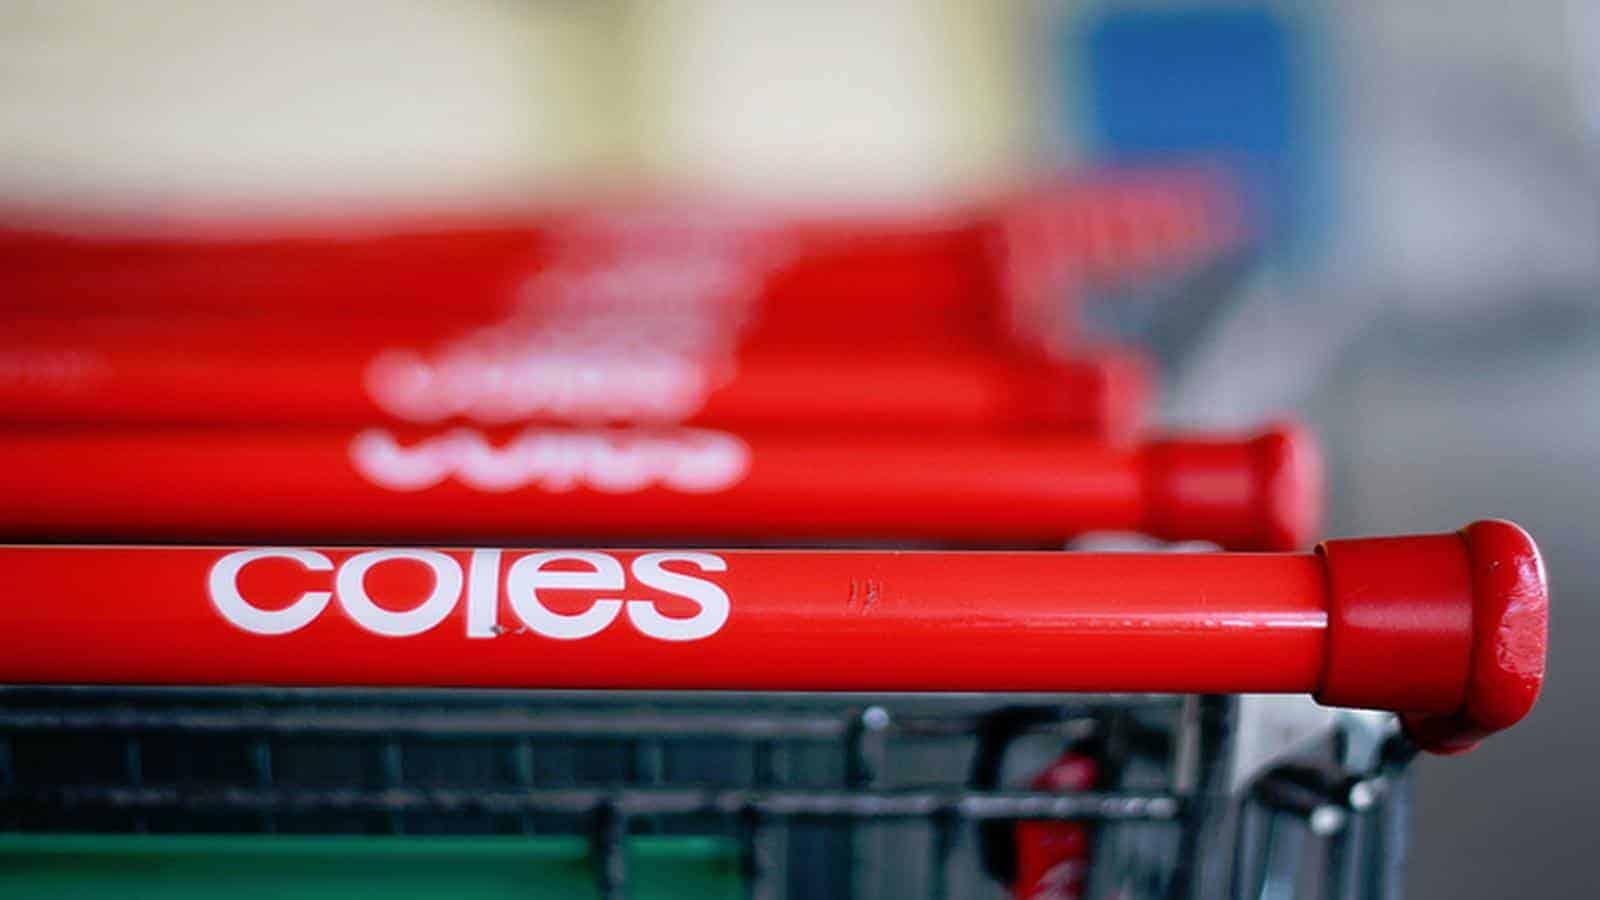 Coles share price